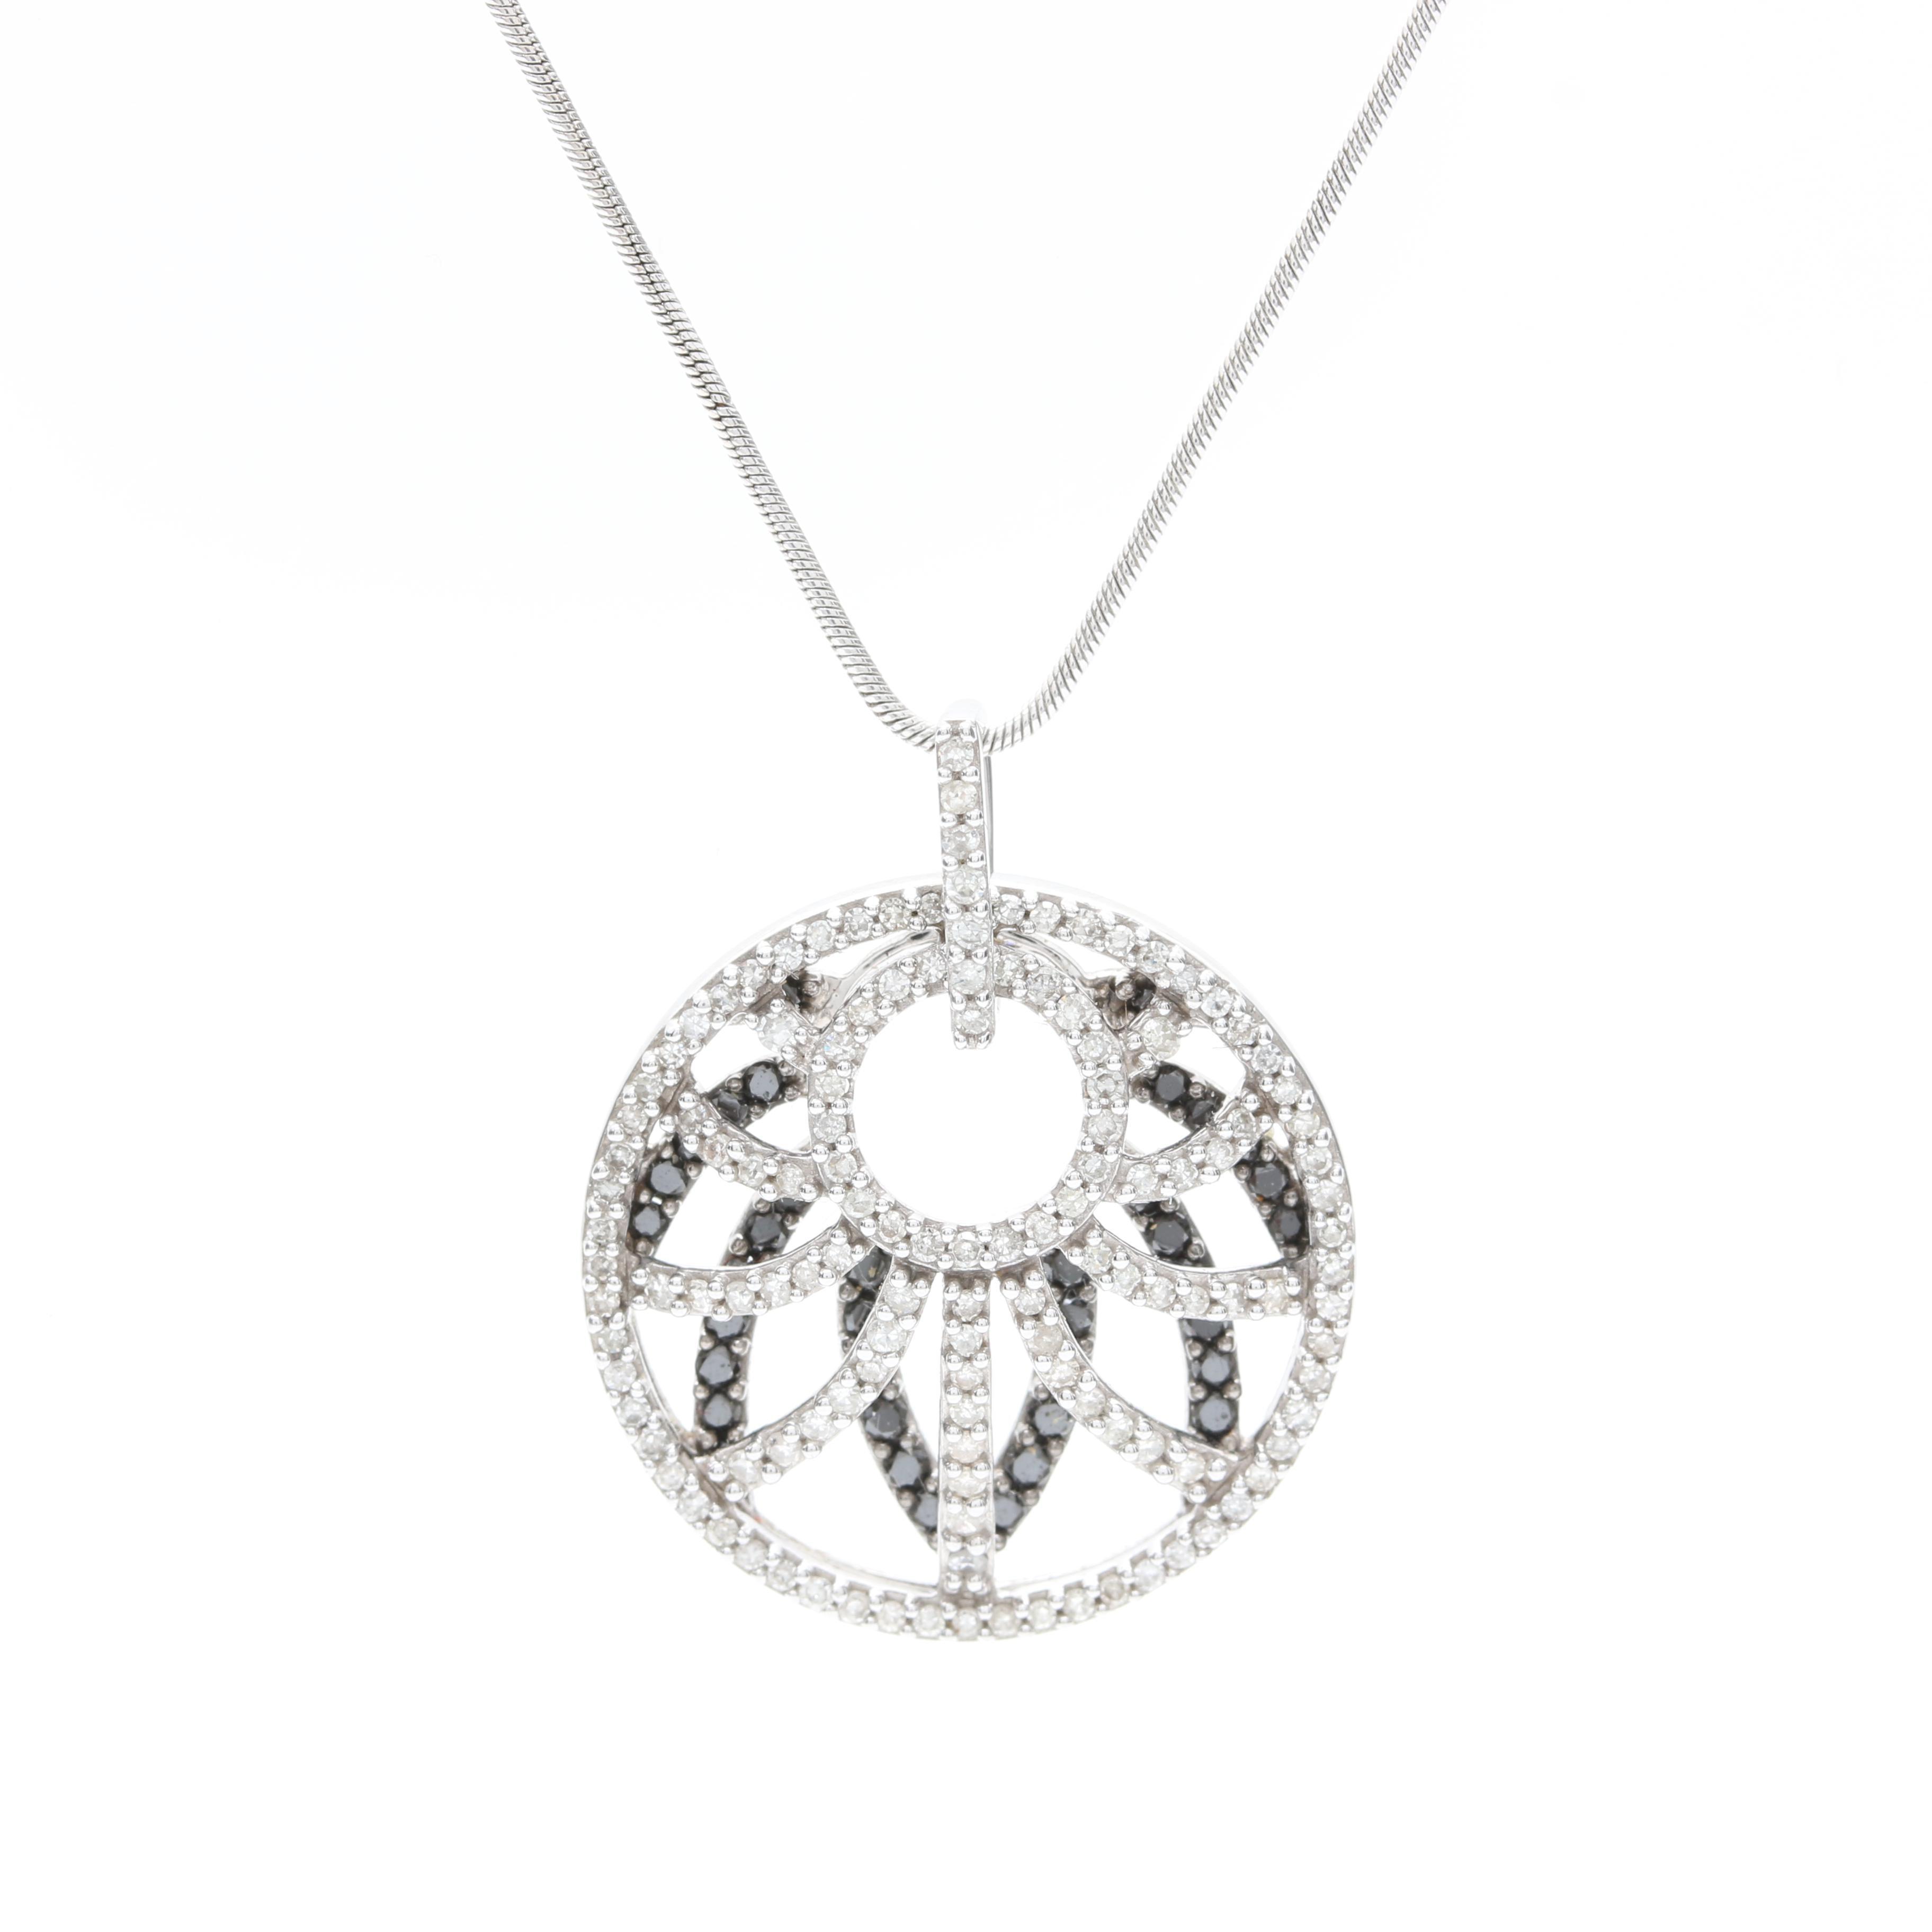 14K White Gold Openwork Diamond Pendant Necklace With Black Diamonds